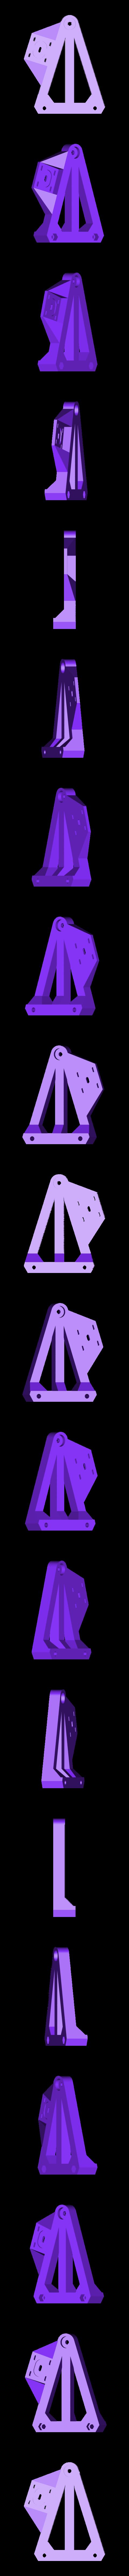 Tilt_base_motor.stl Download STL file Panohead • 3D print model, Cavada